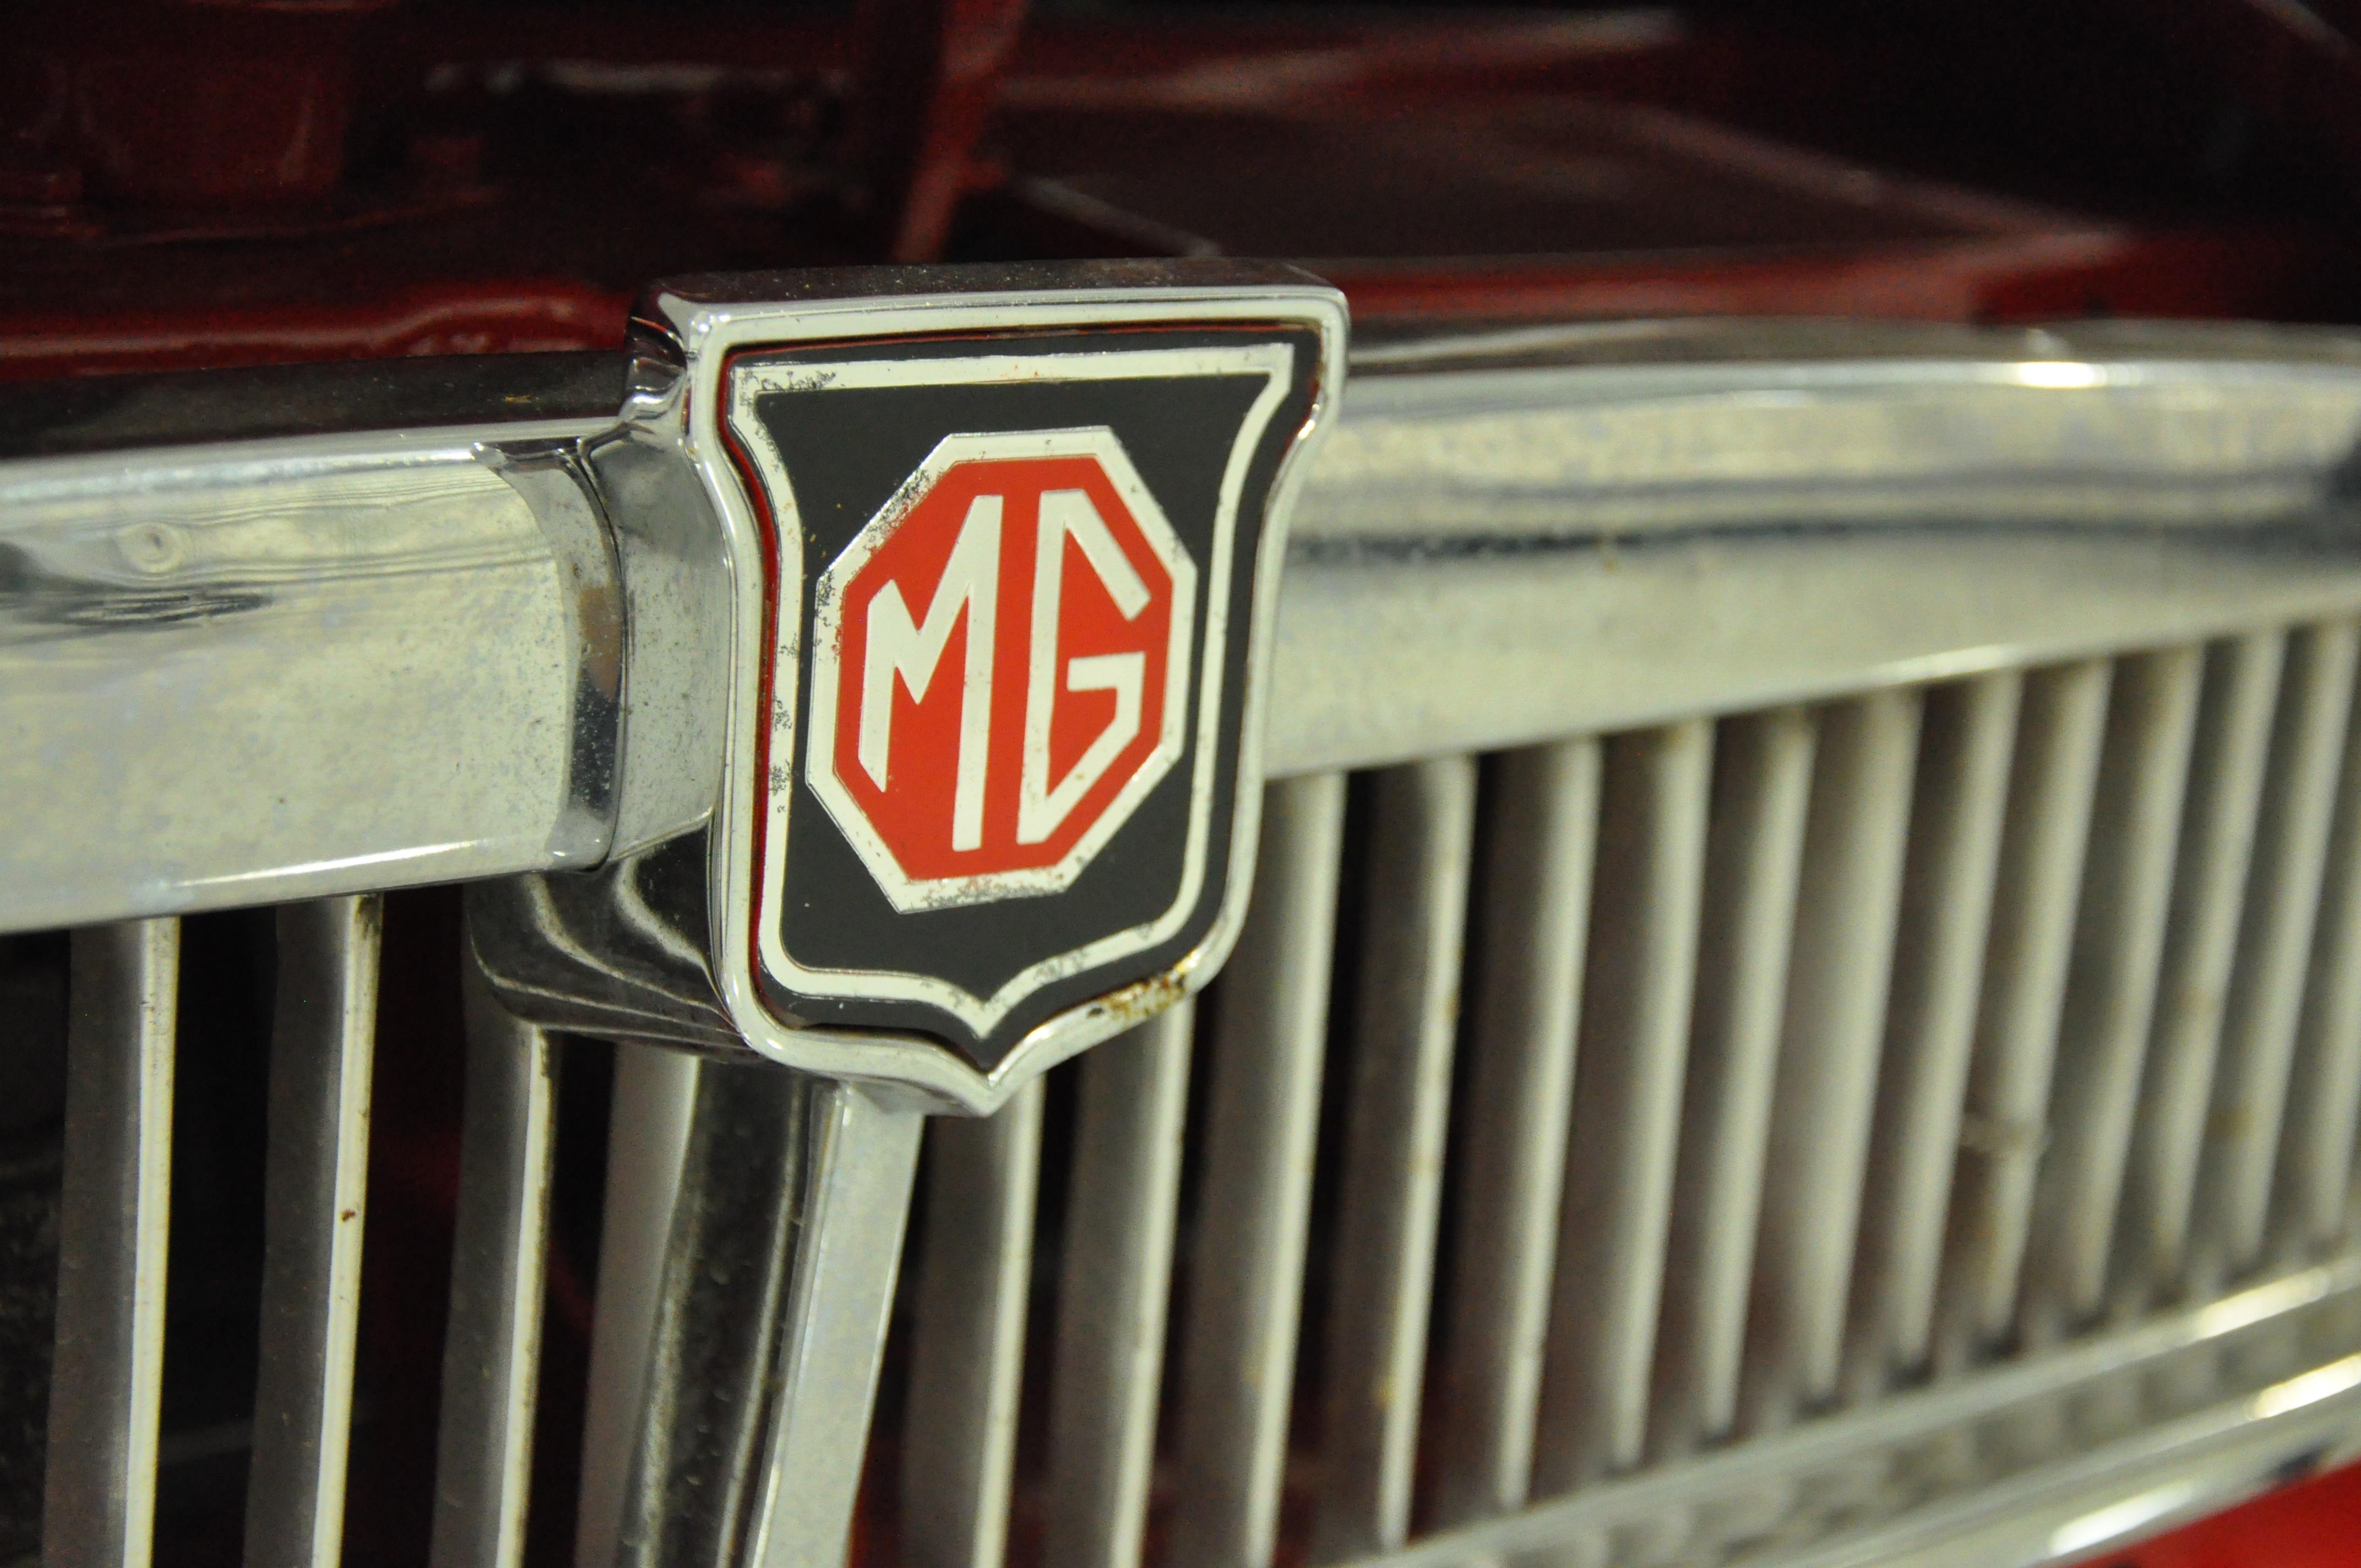 1963 MGB Racecar